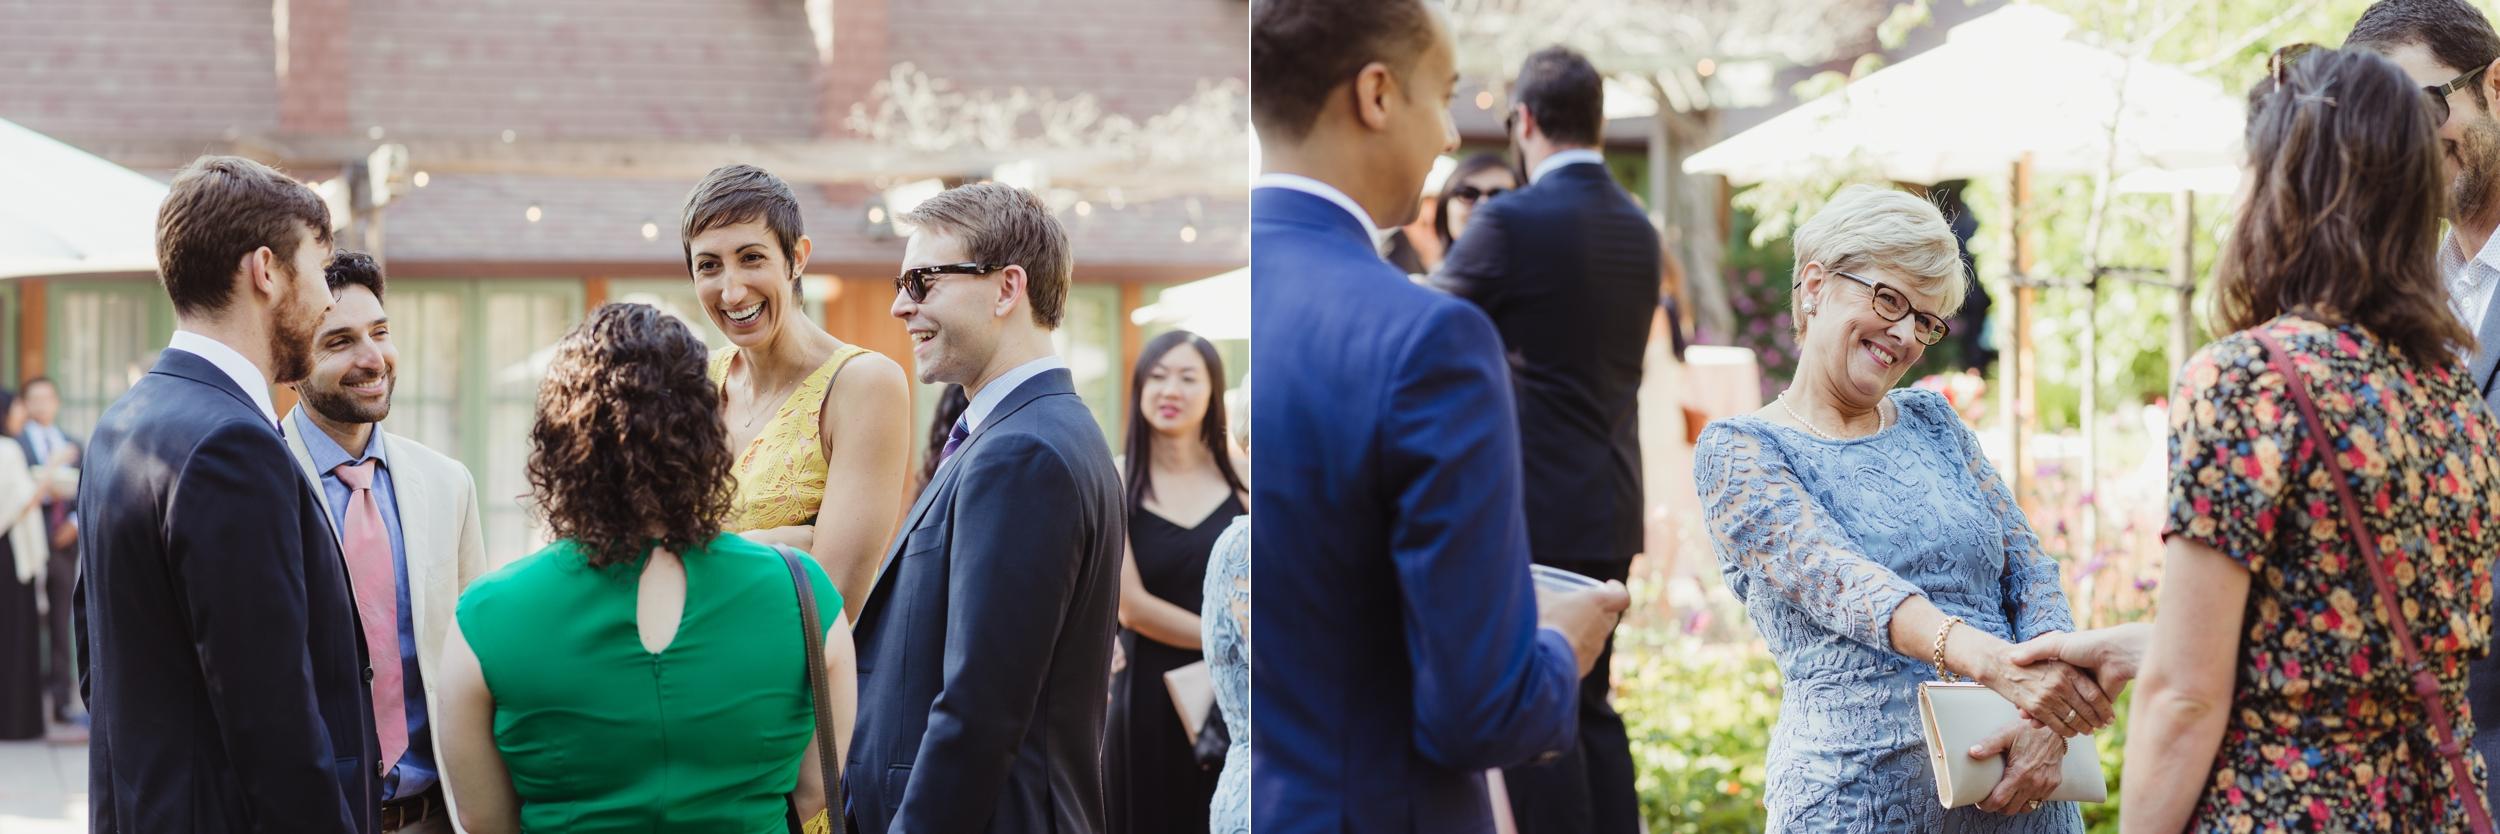 24-outdoor-art-club-wedding-vivianchen-142_WEB.jpg